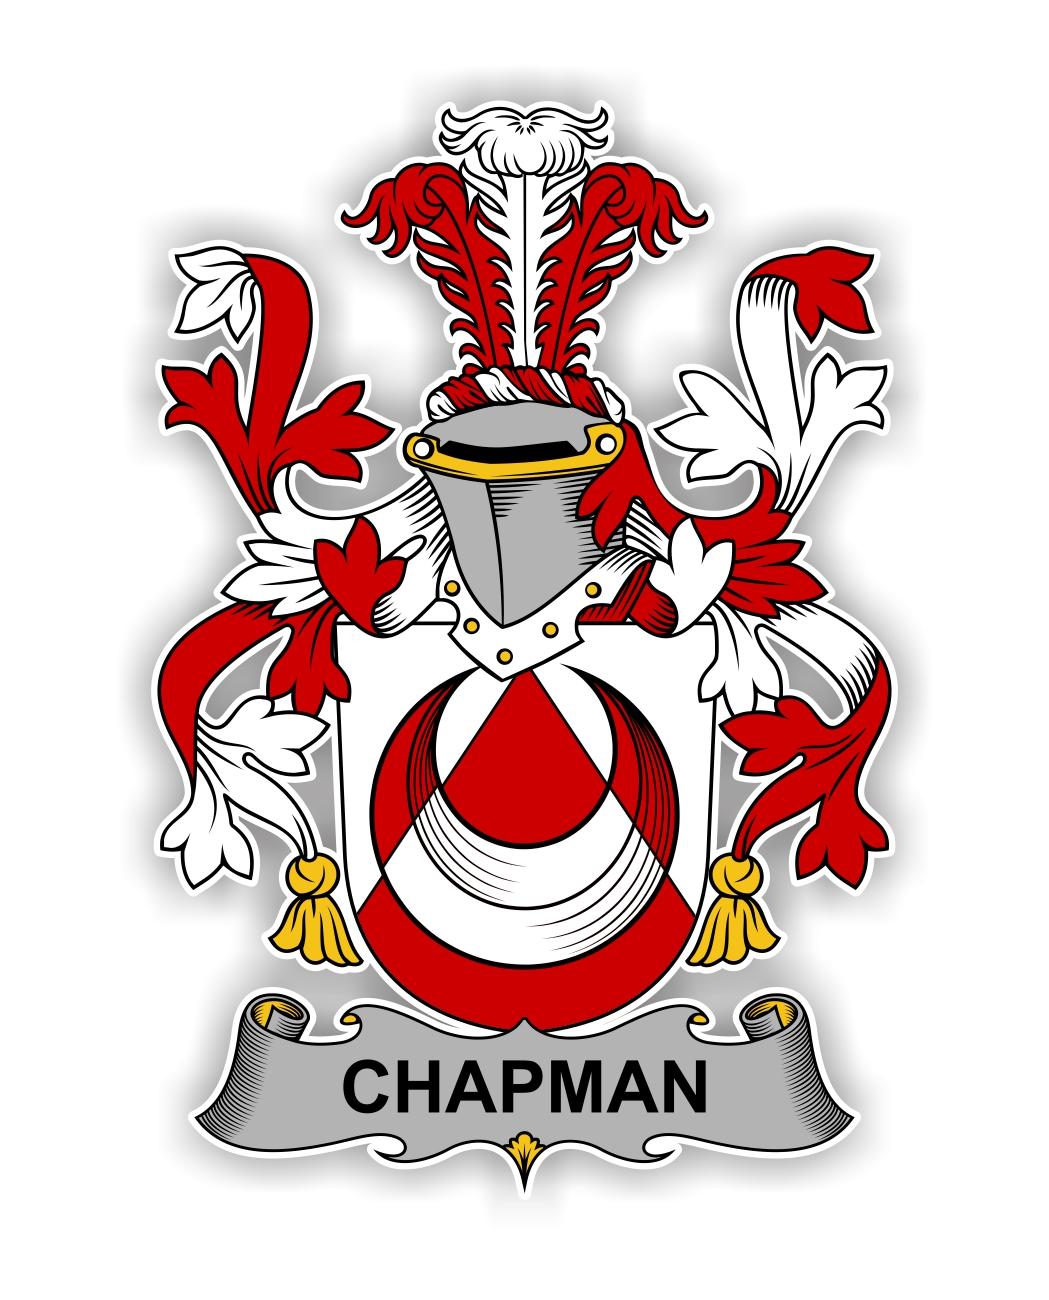 Chapman Family Crest Vinyl Die Cut Decal Sticker 4